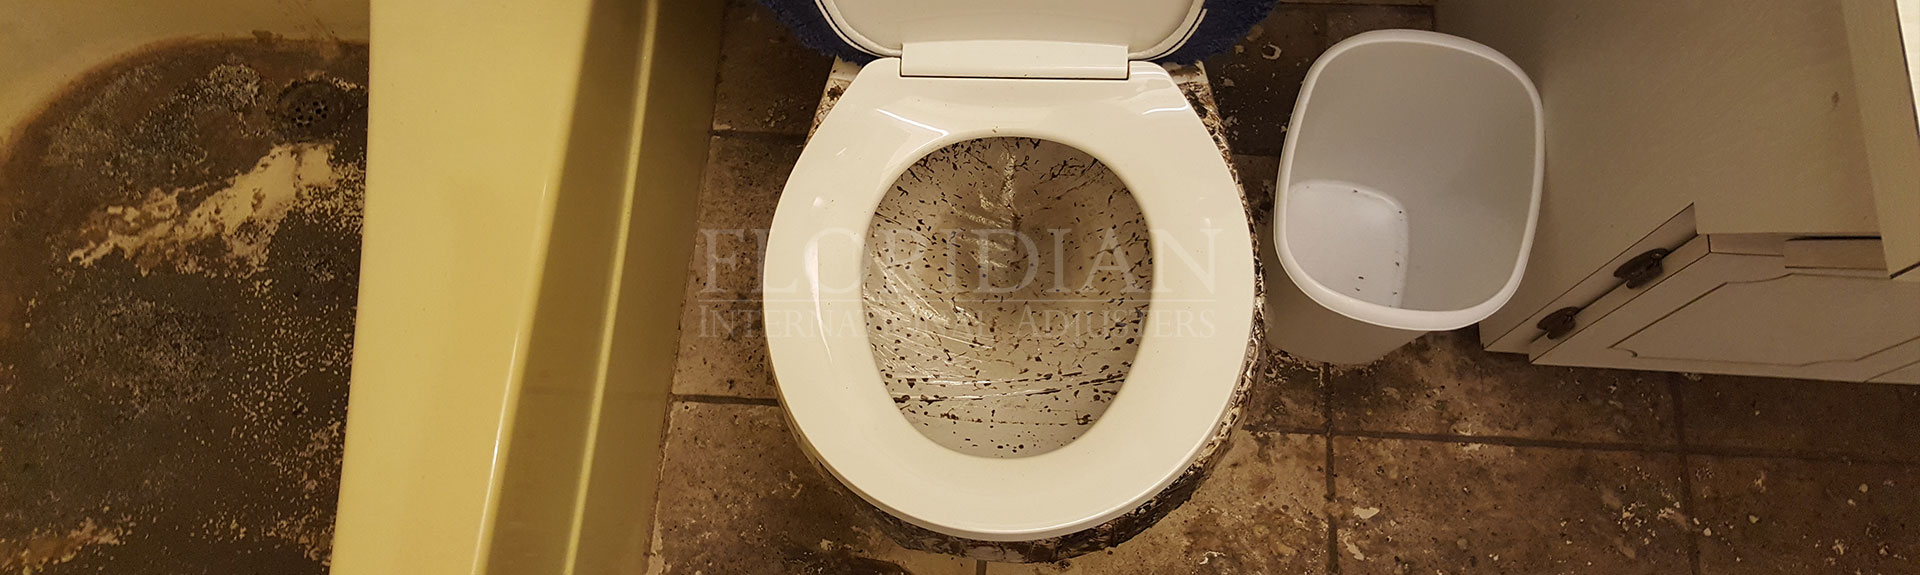 Plumbing insurance claim